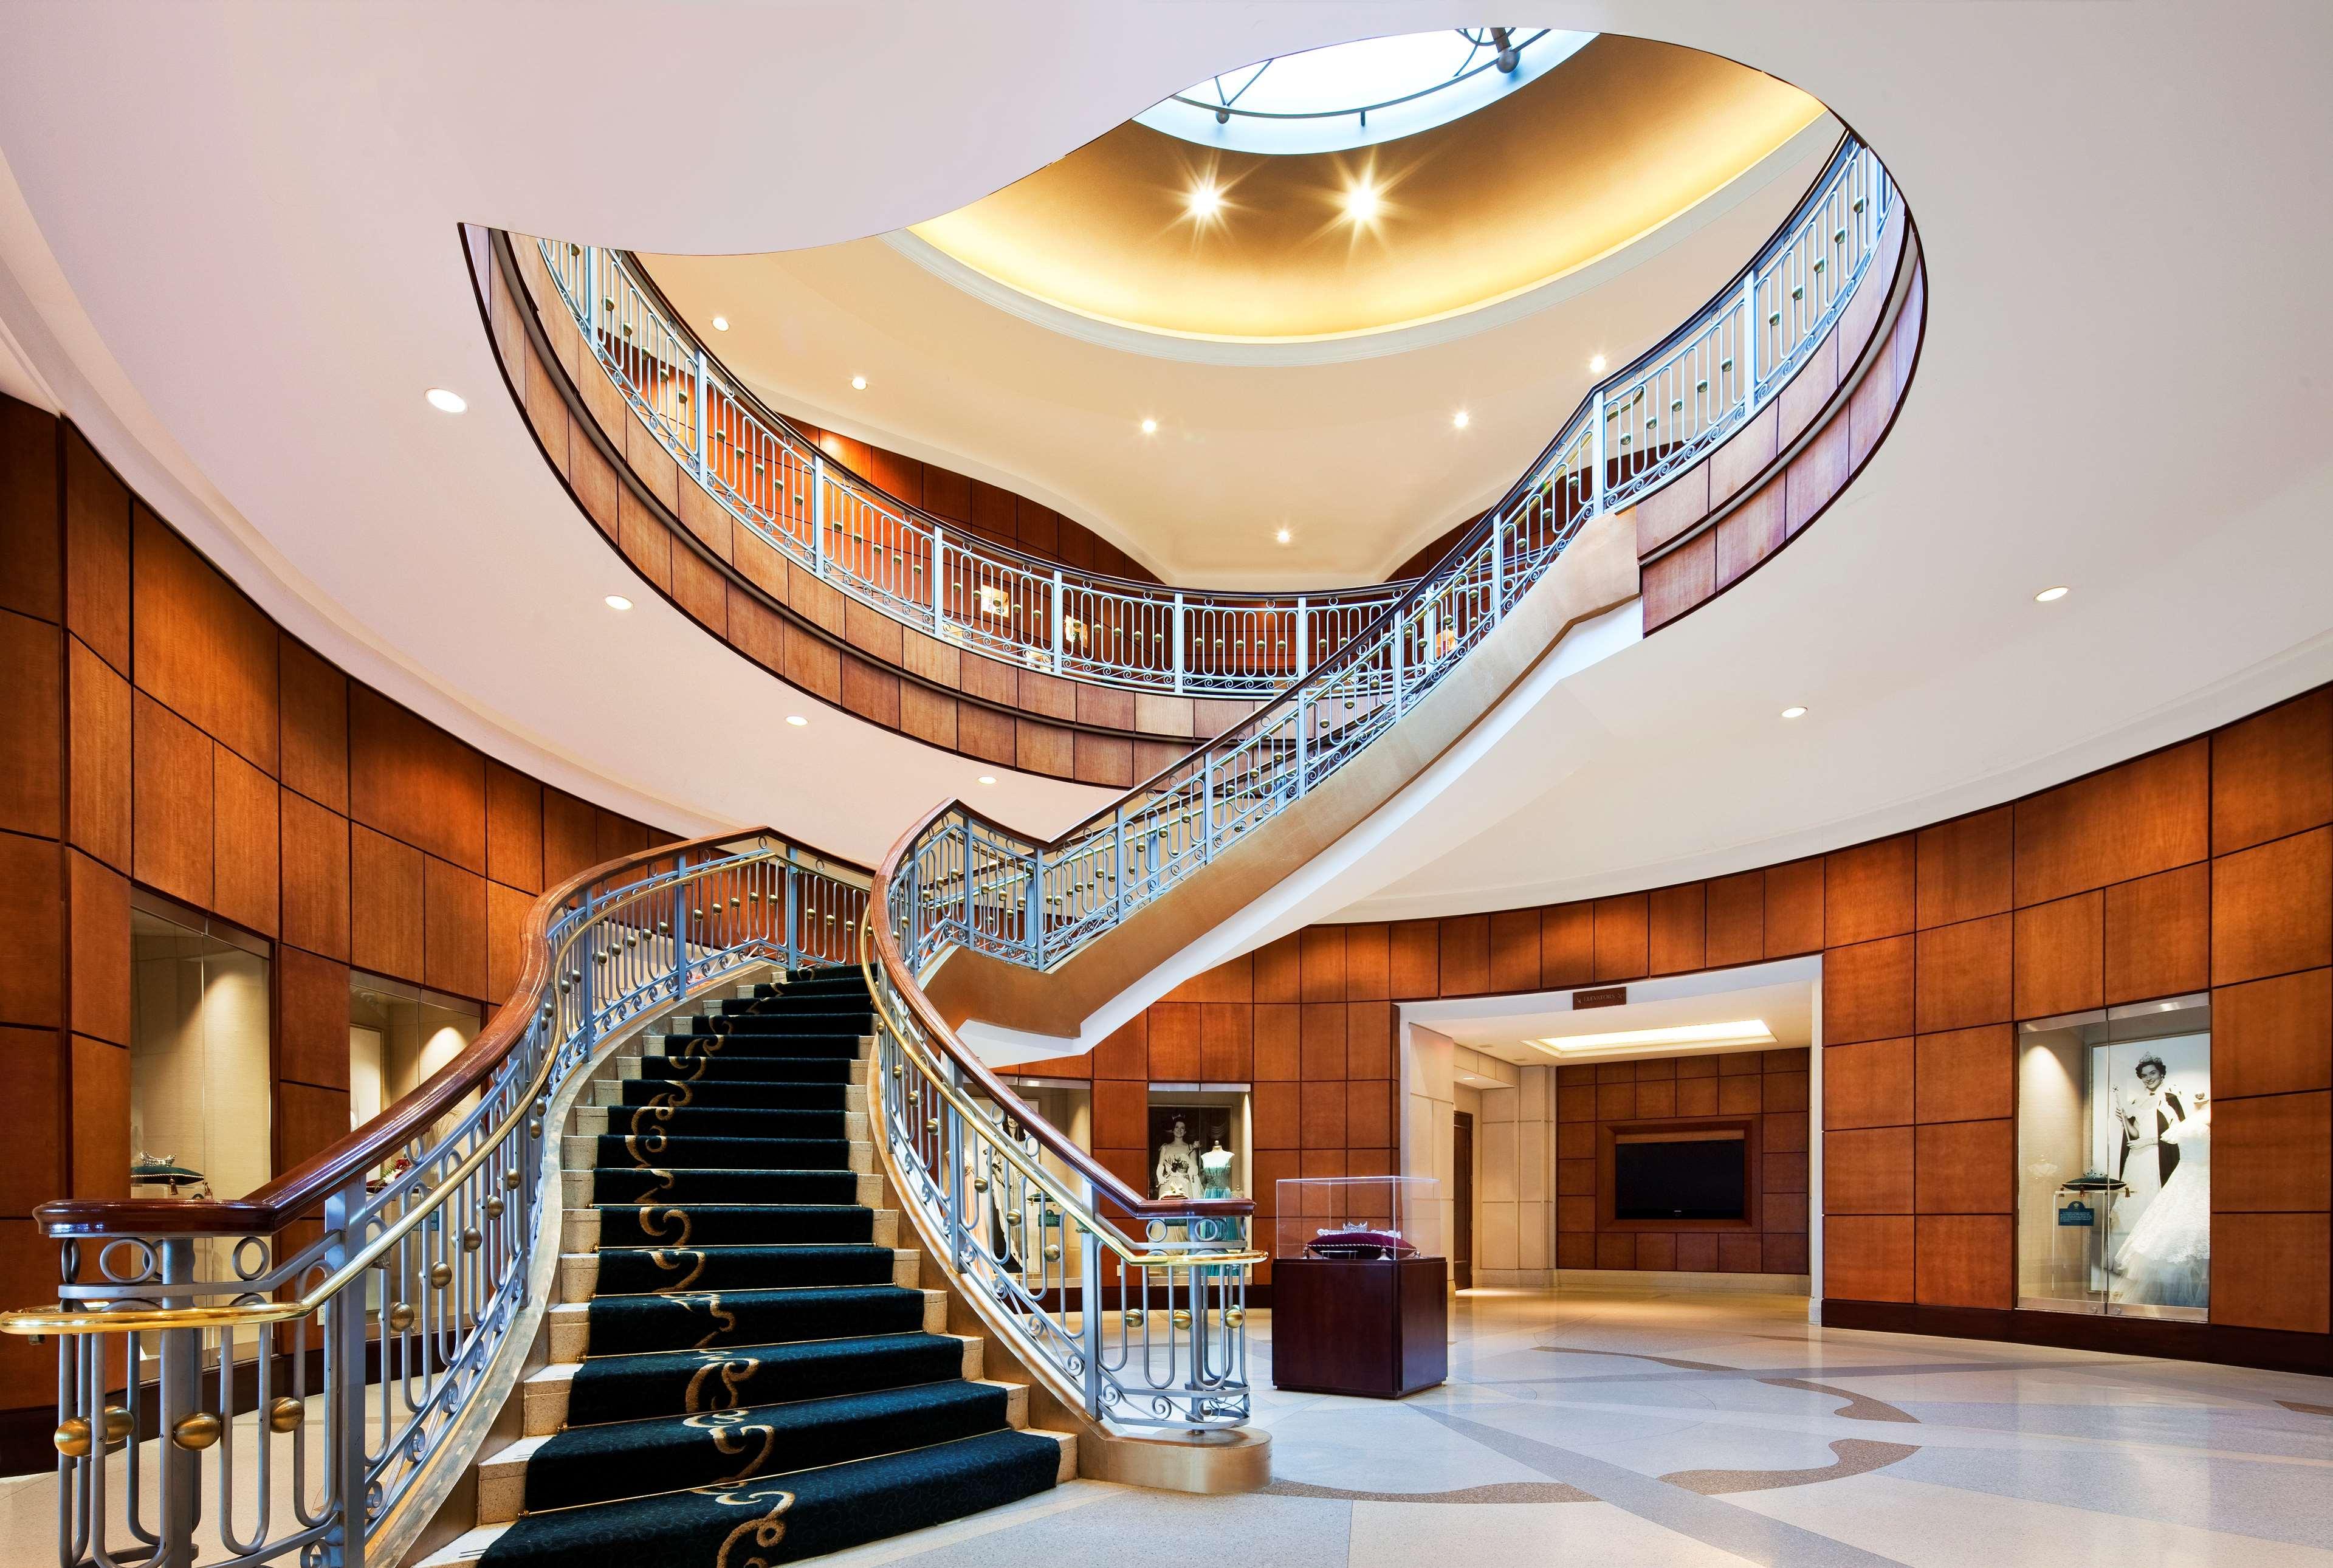 Sheraton Atlantic City Convention Center Hotel image 19